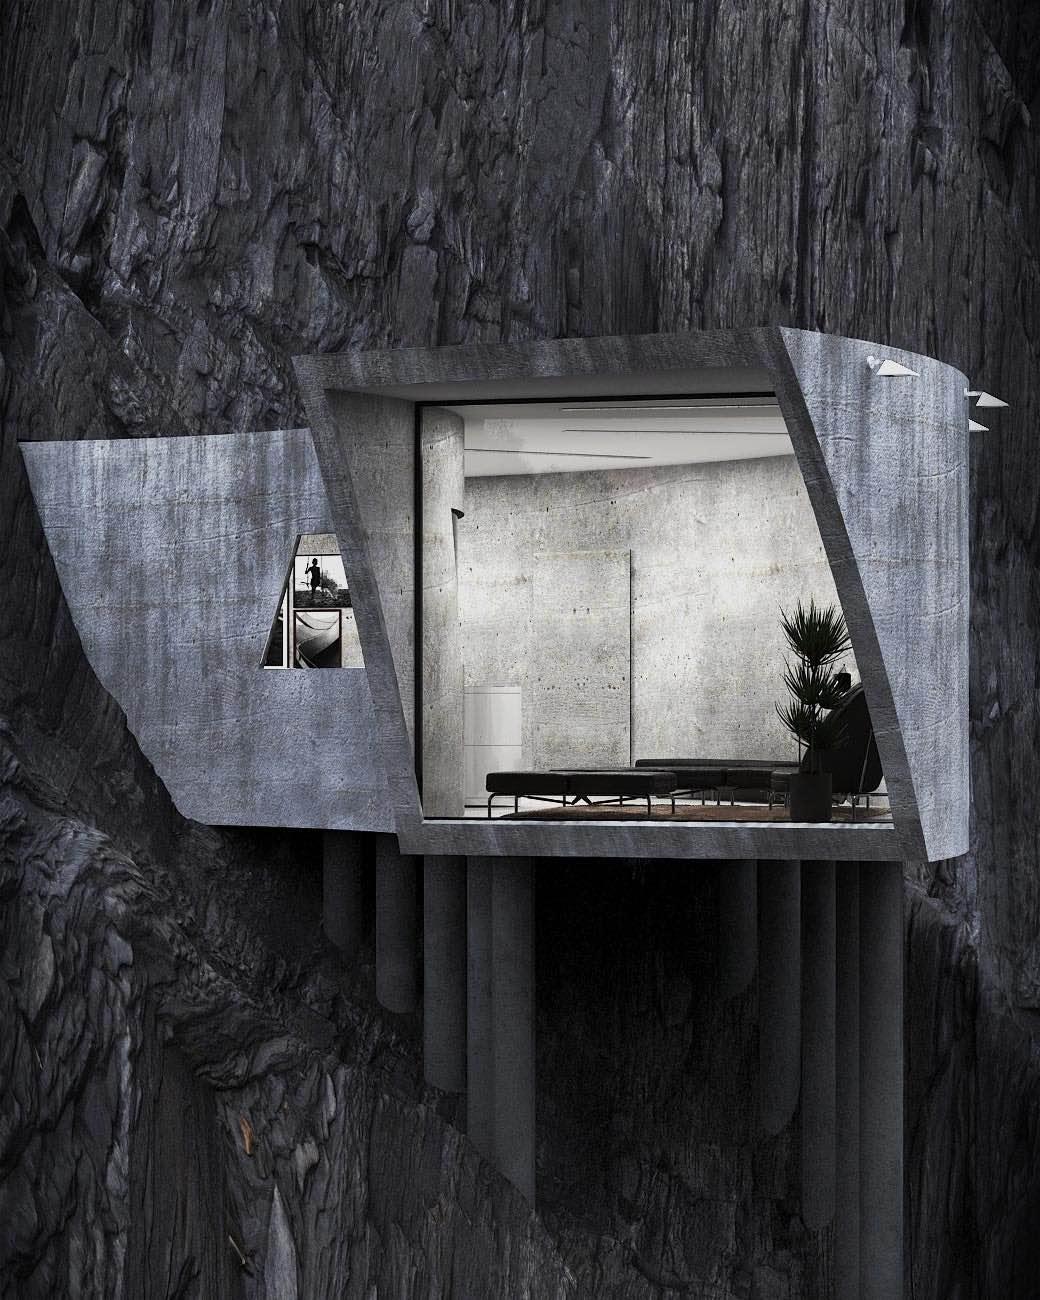 concrete house in a Rocky Mountain